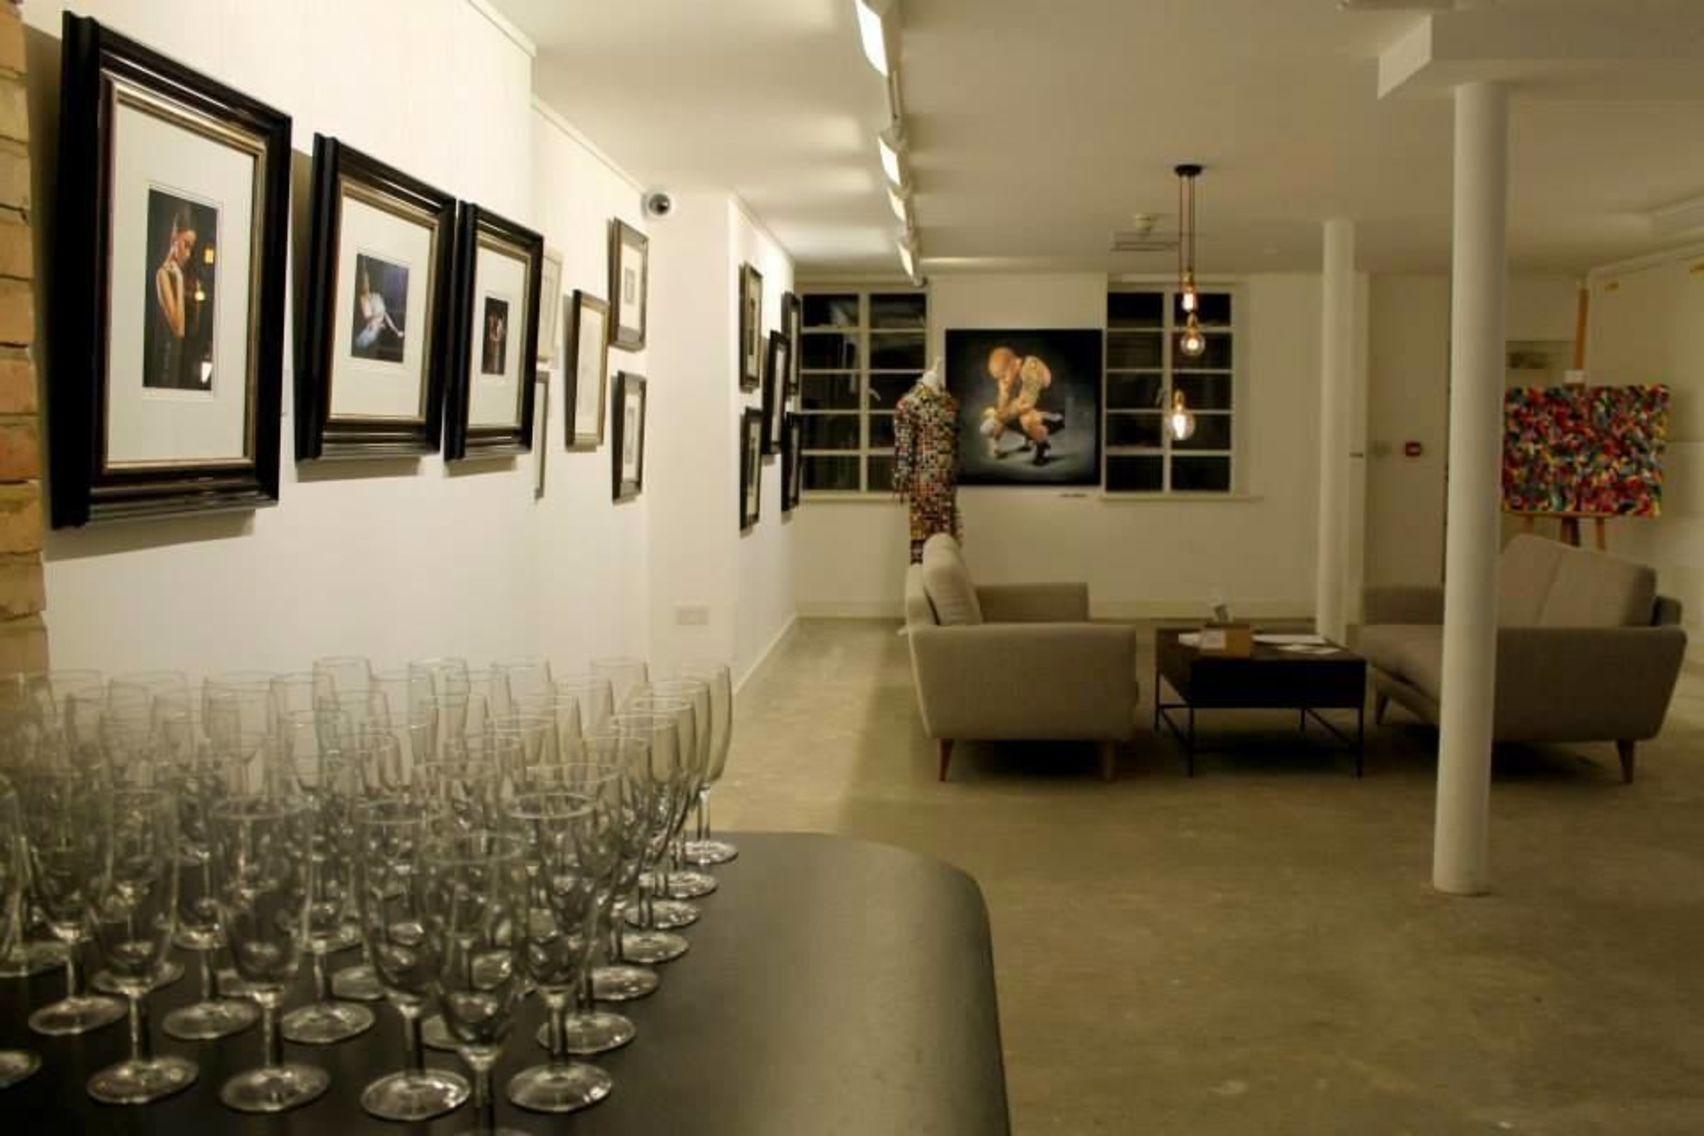 Day Hire, Lower Ground Floor, Darren Baker Gallery